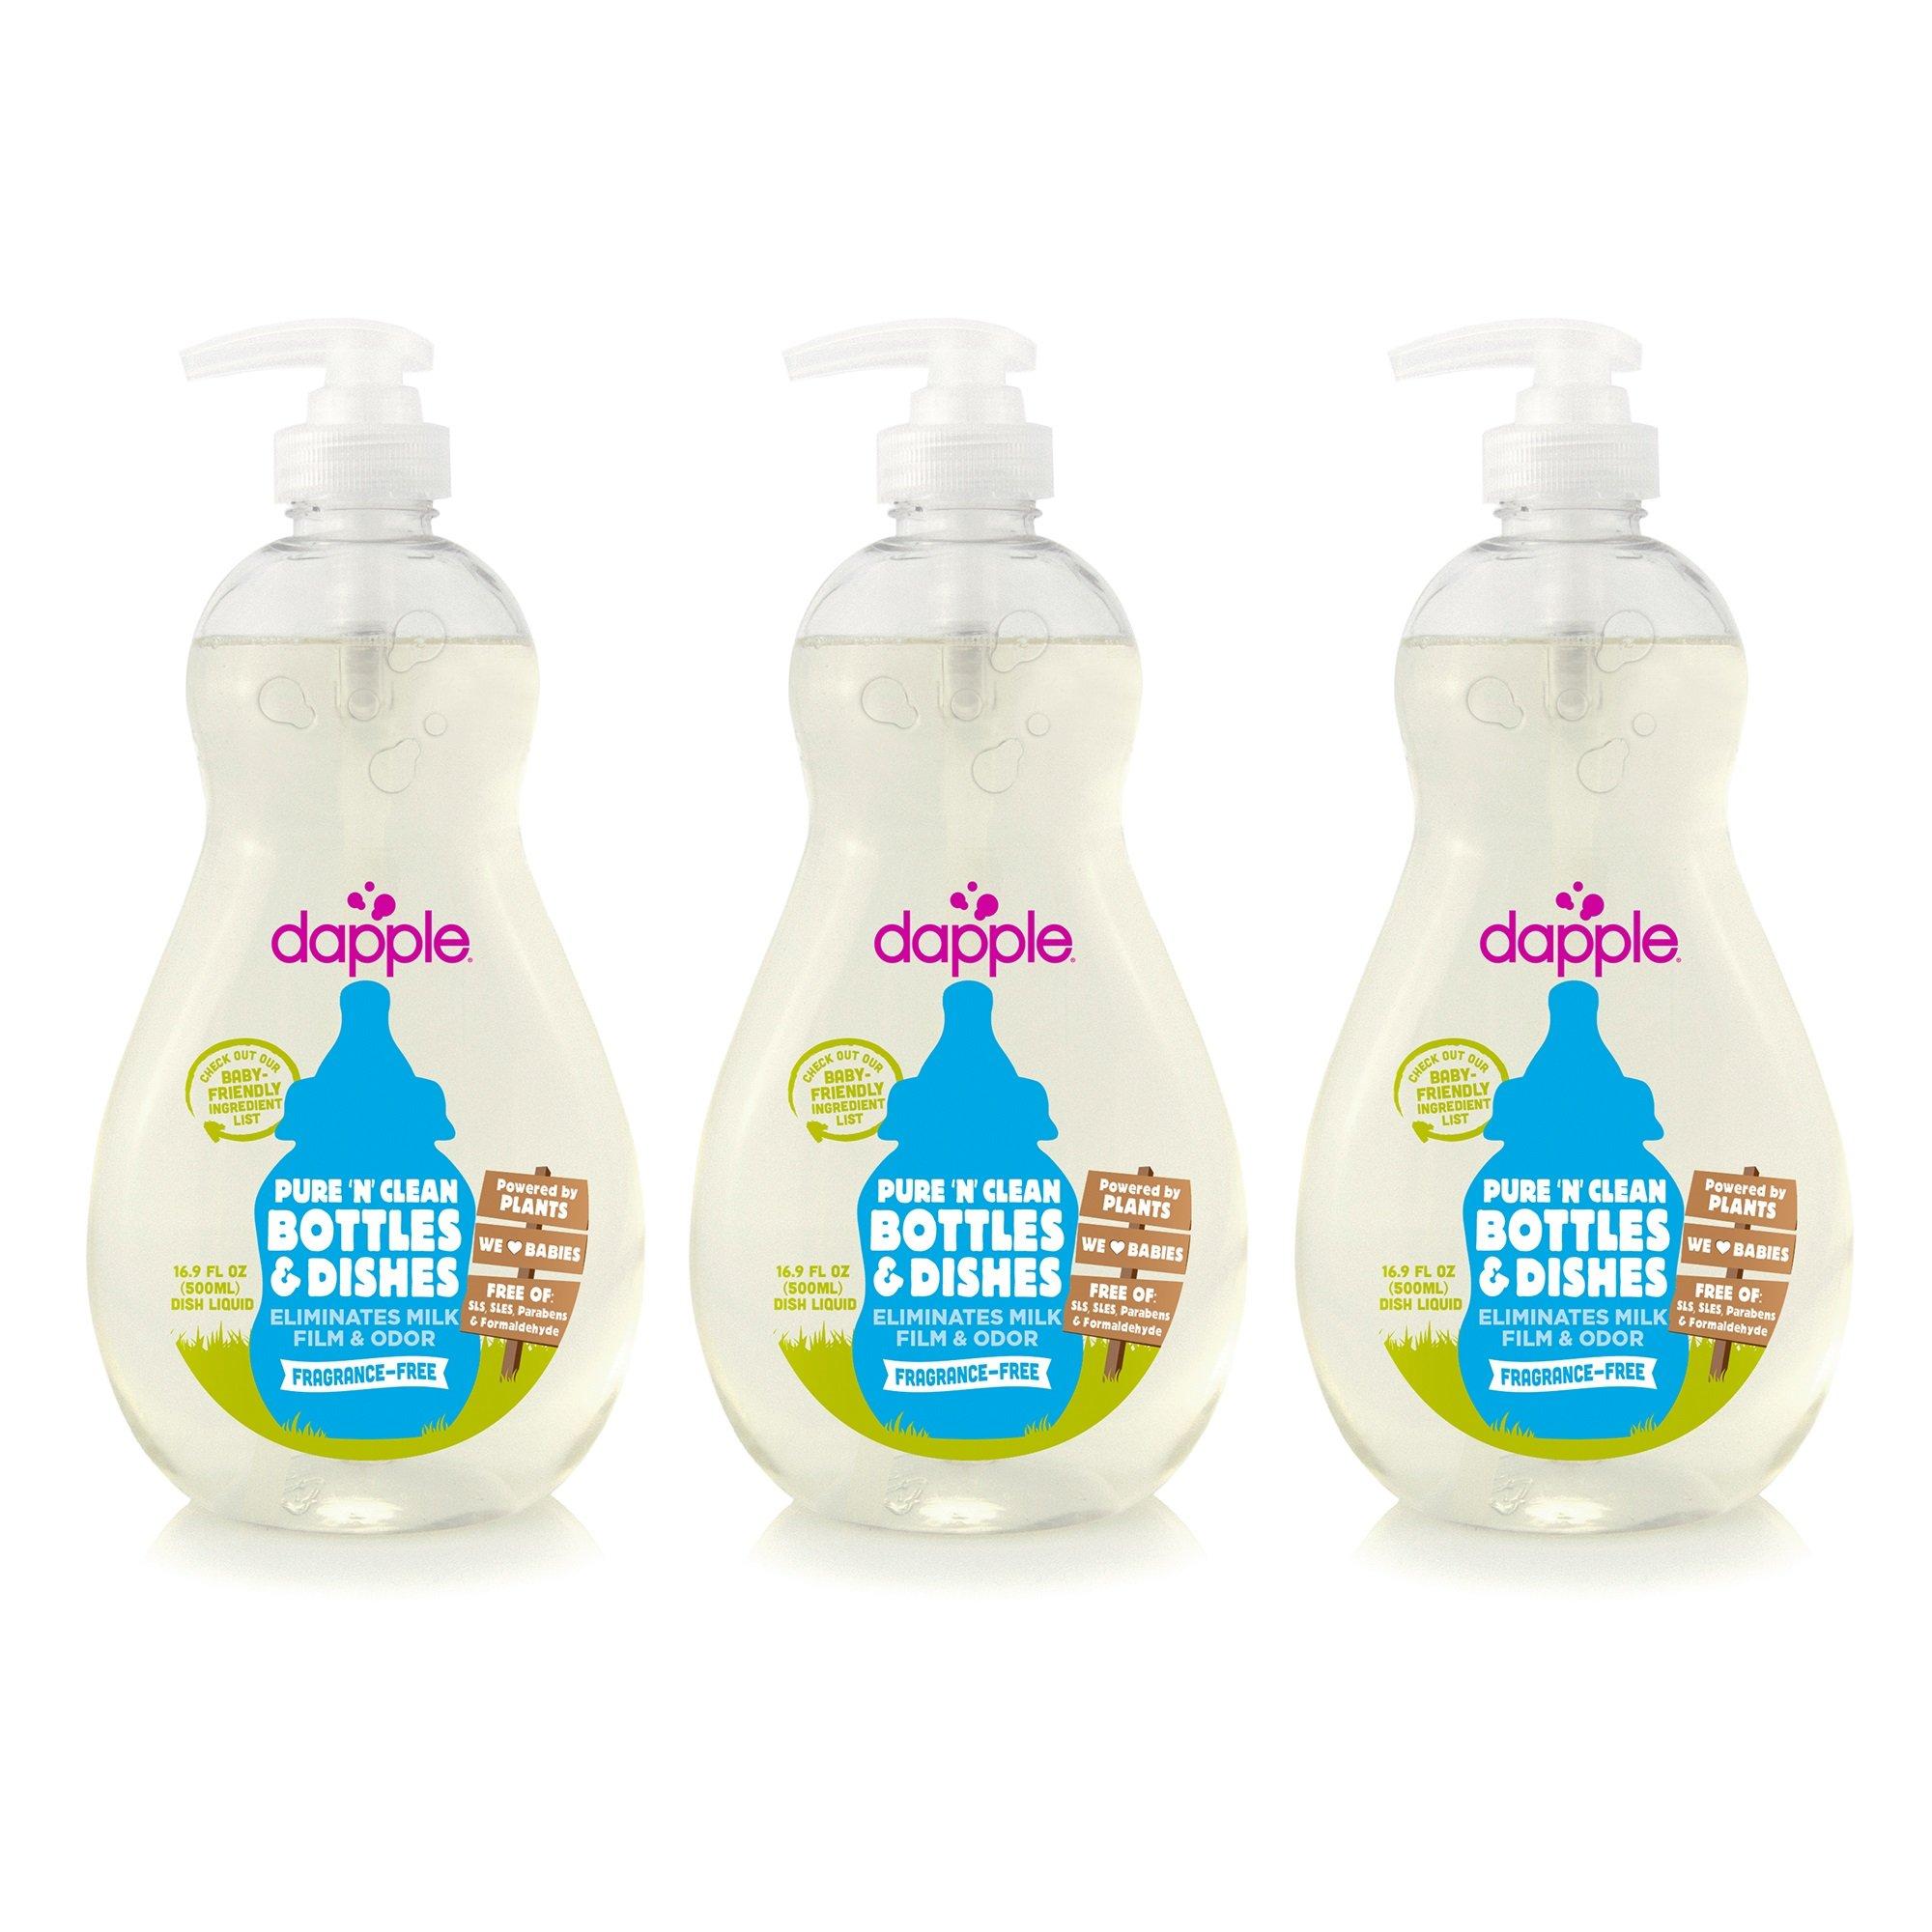 Dapple Baby Bottle and Dish Liquid, Fragrance Free Liquid Soap, Baby Dish Soap, Baby Dish Liquid, Bottle and Dish Liquid Cleaner, Plant-Based Formula, 16.9 Fluid Ounces (Pack of 3)